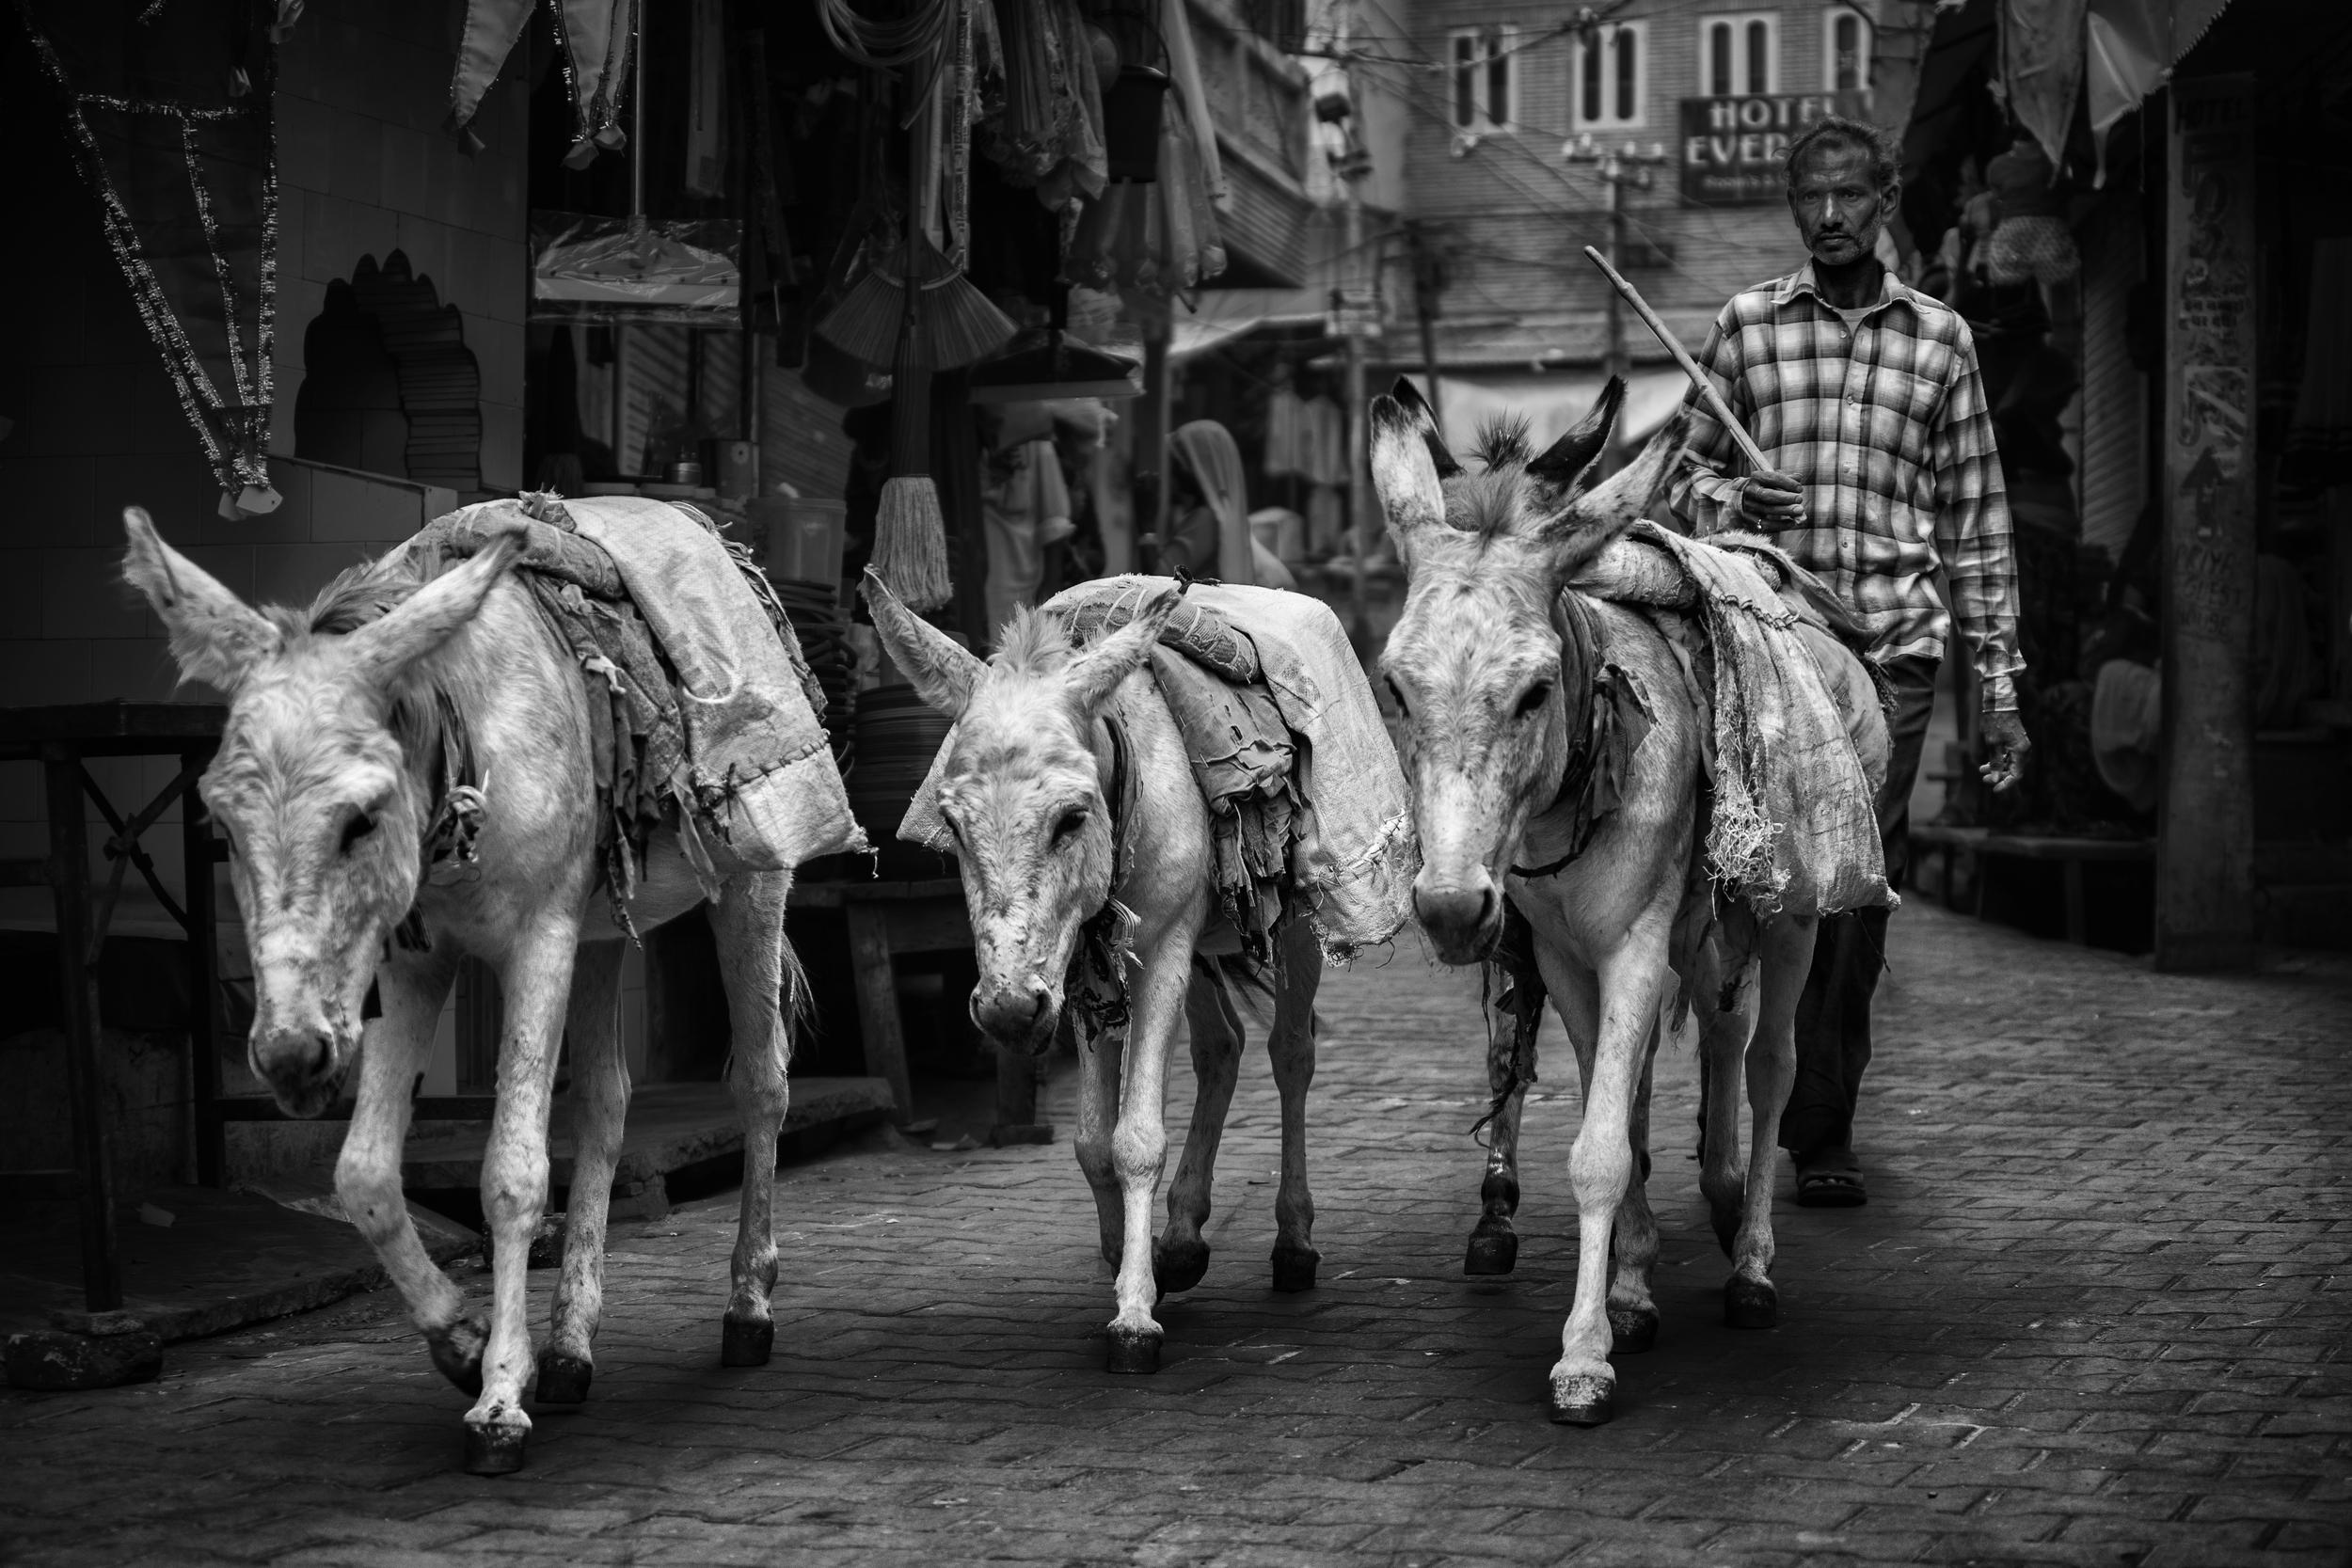 shepherd in the streets of pushkar